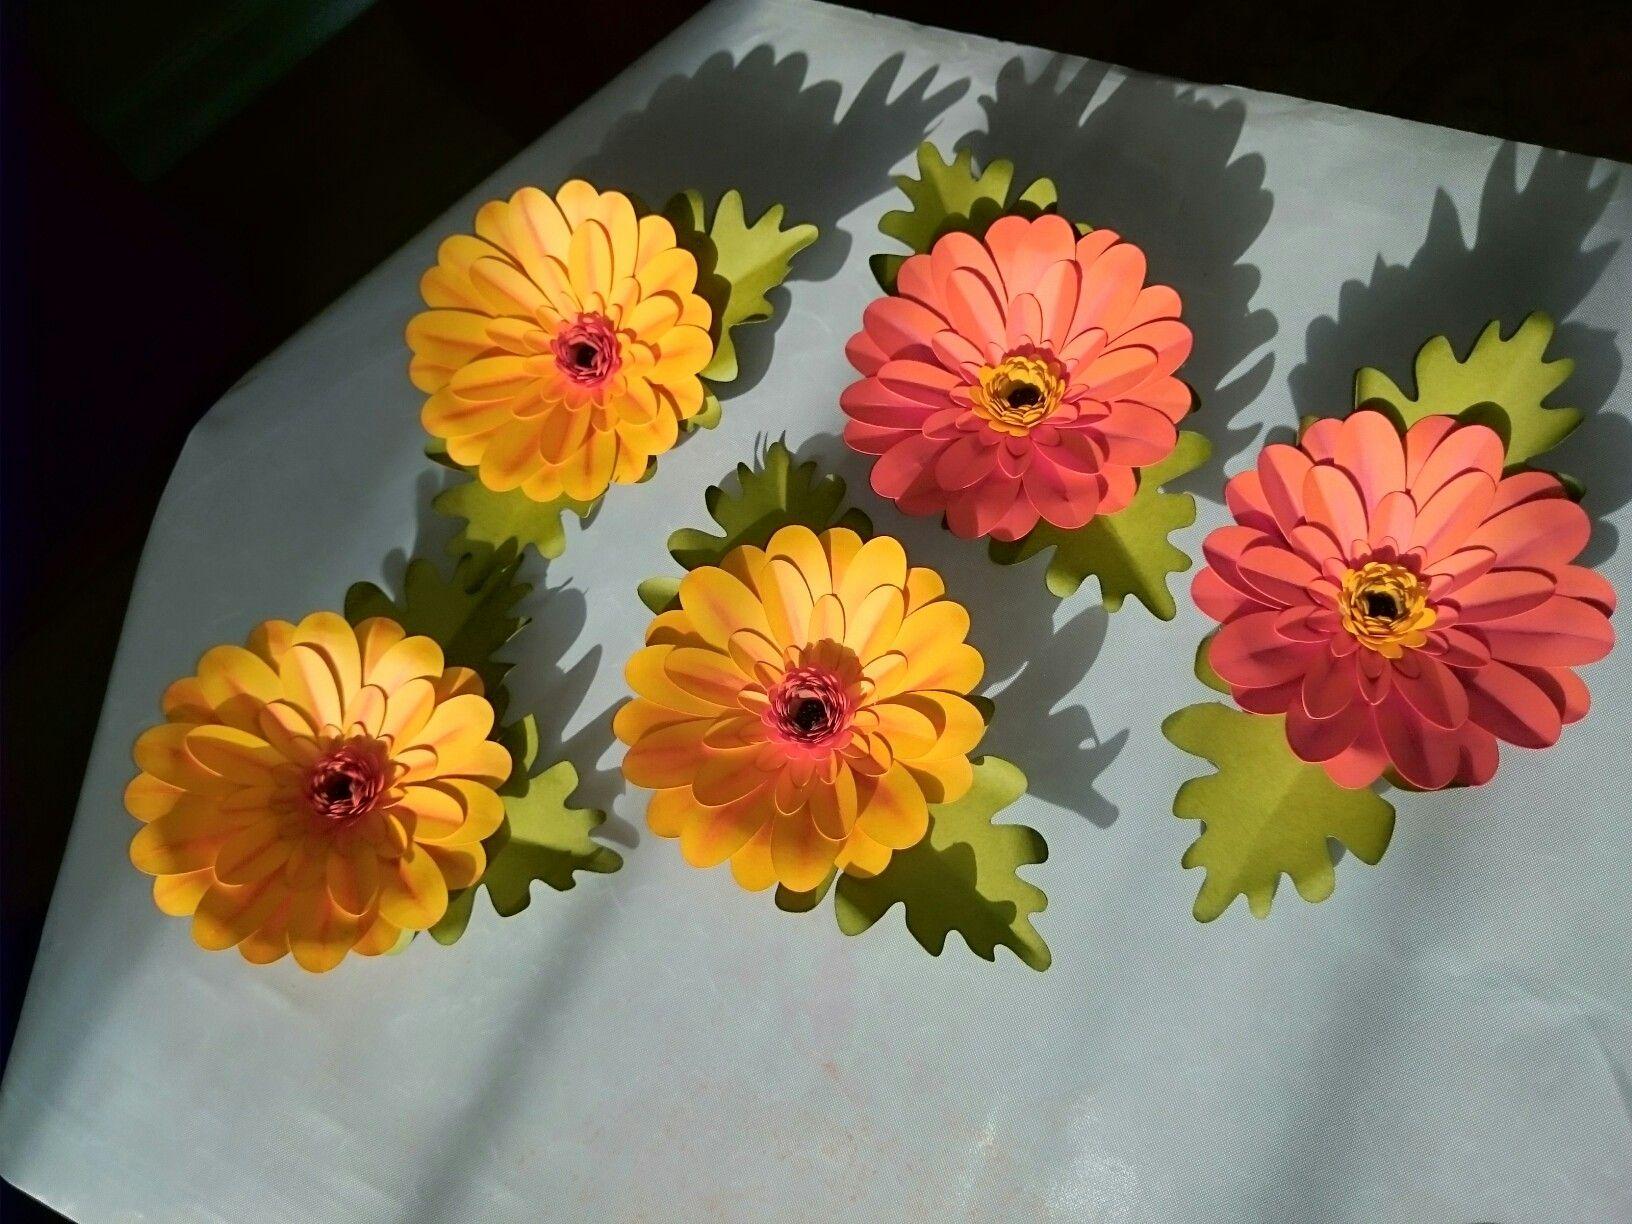 Gerber daisies made with Cricut Flower Shoppe cartridge using daisy cut, distress inks, and gelatos